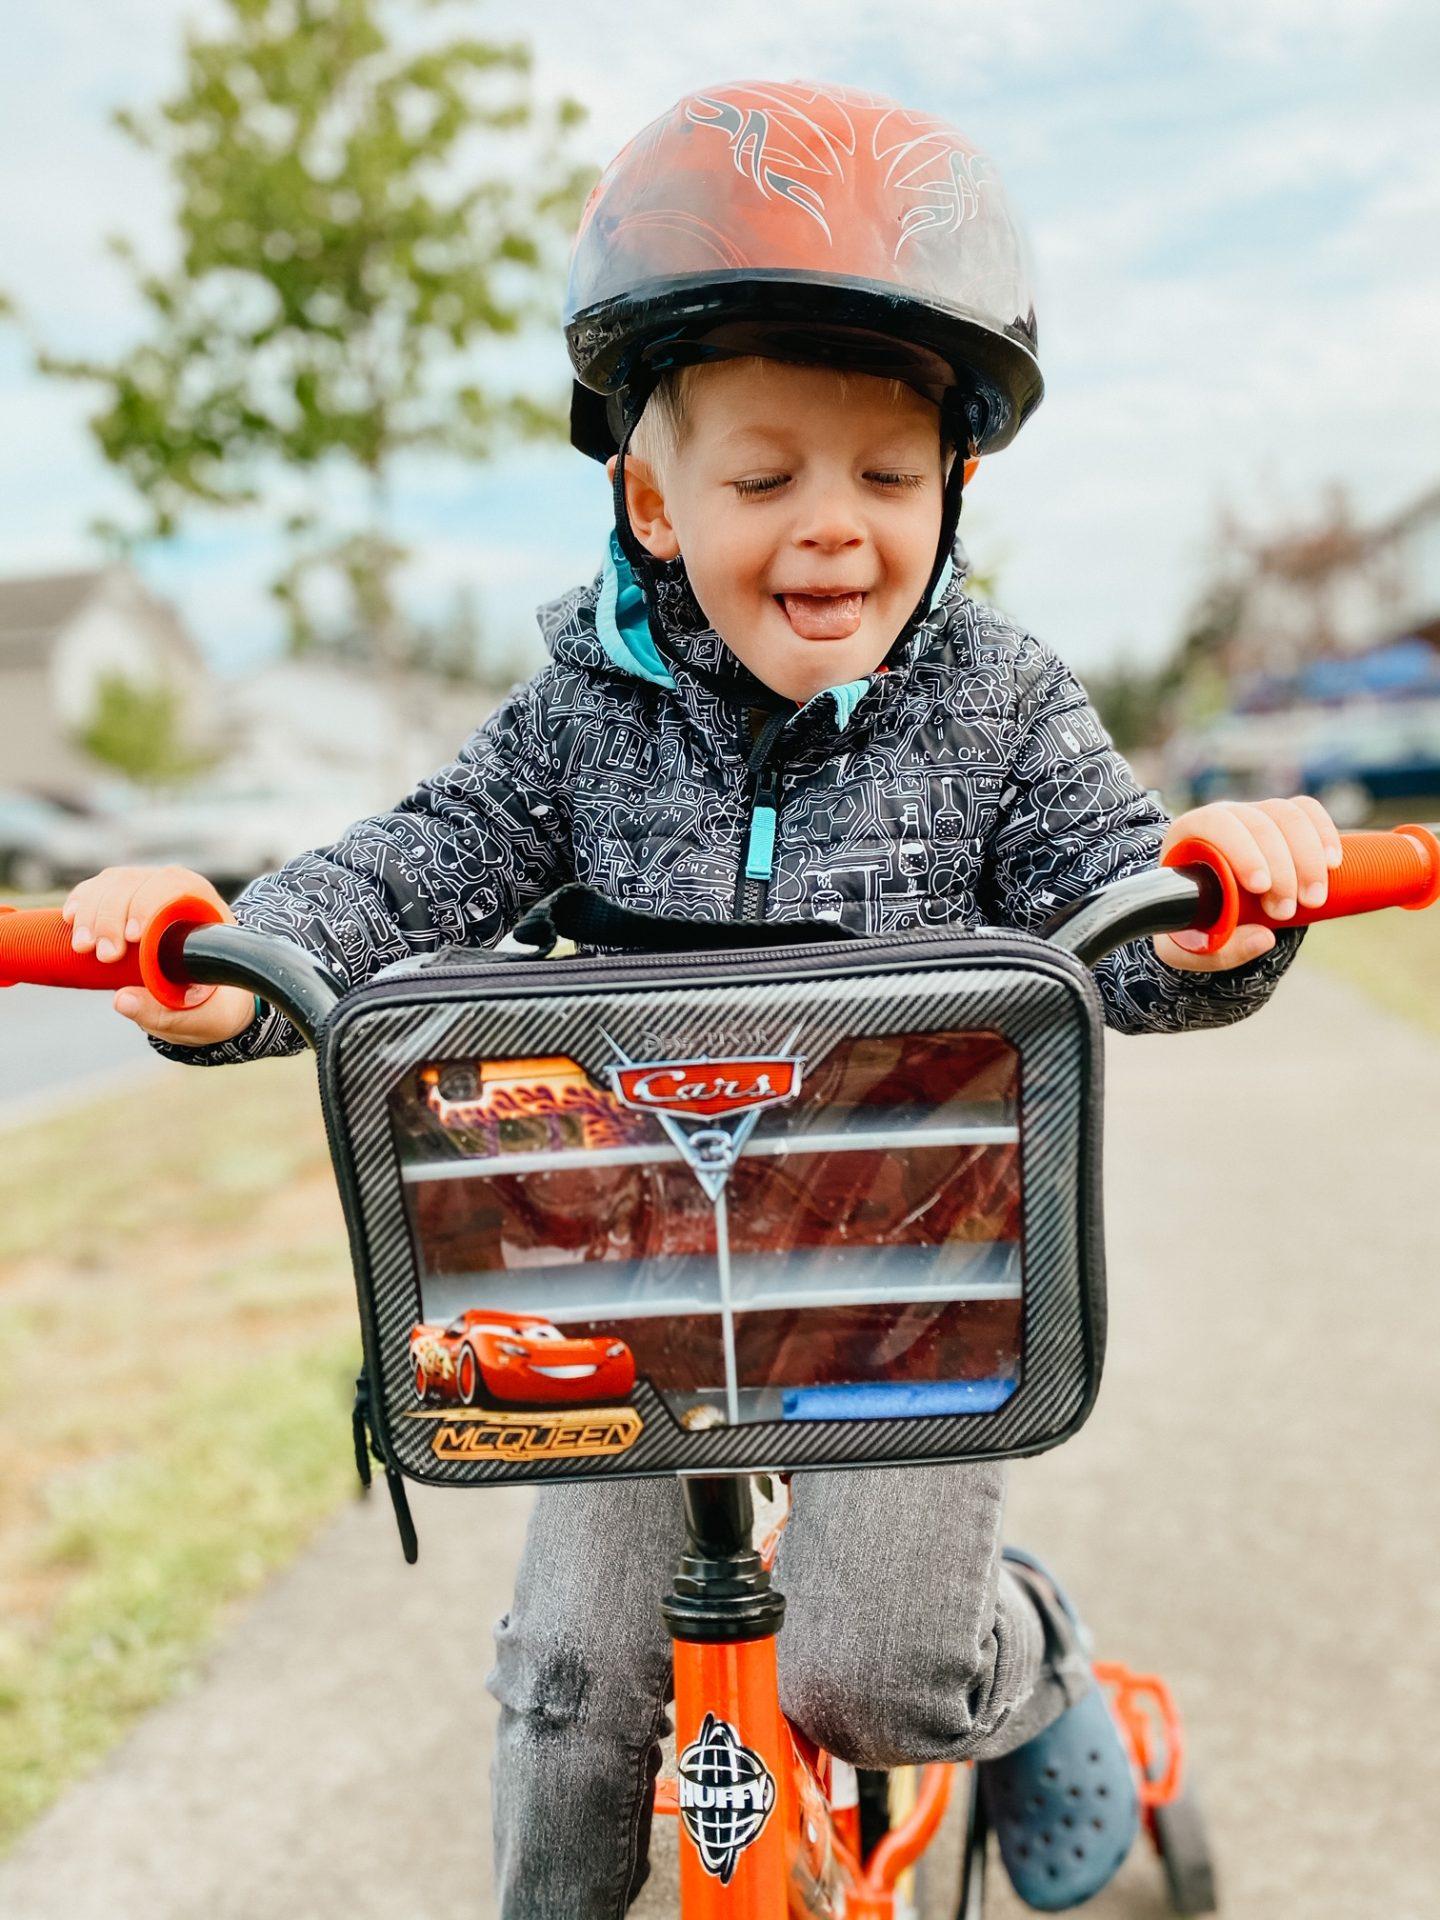 quarantine bike rides